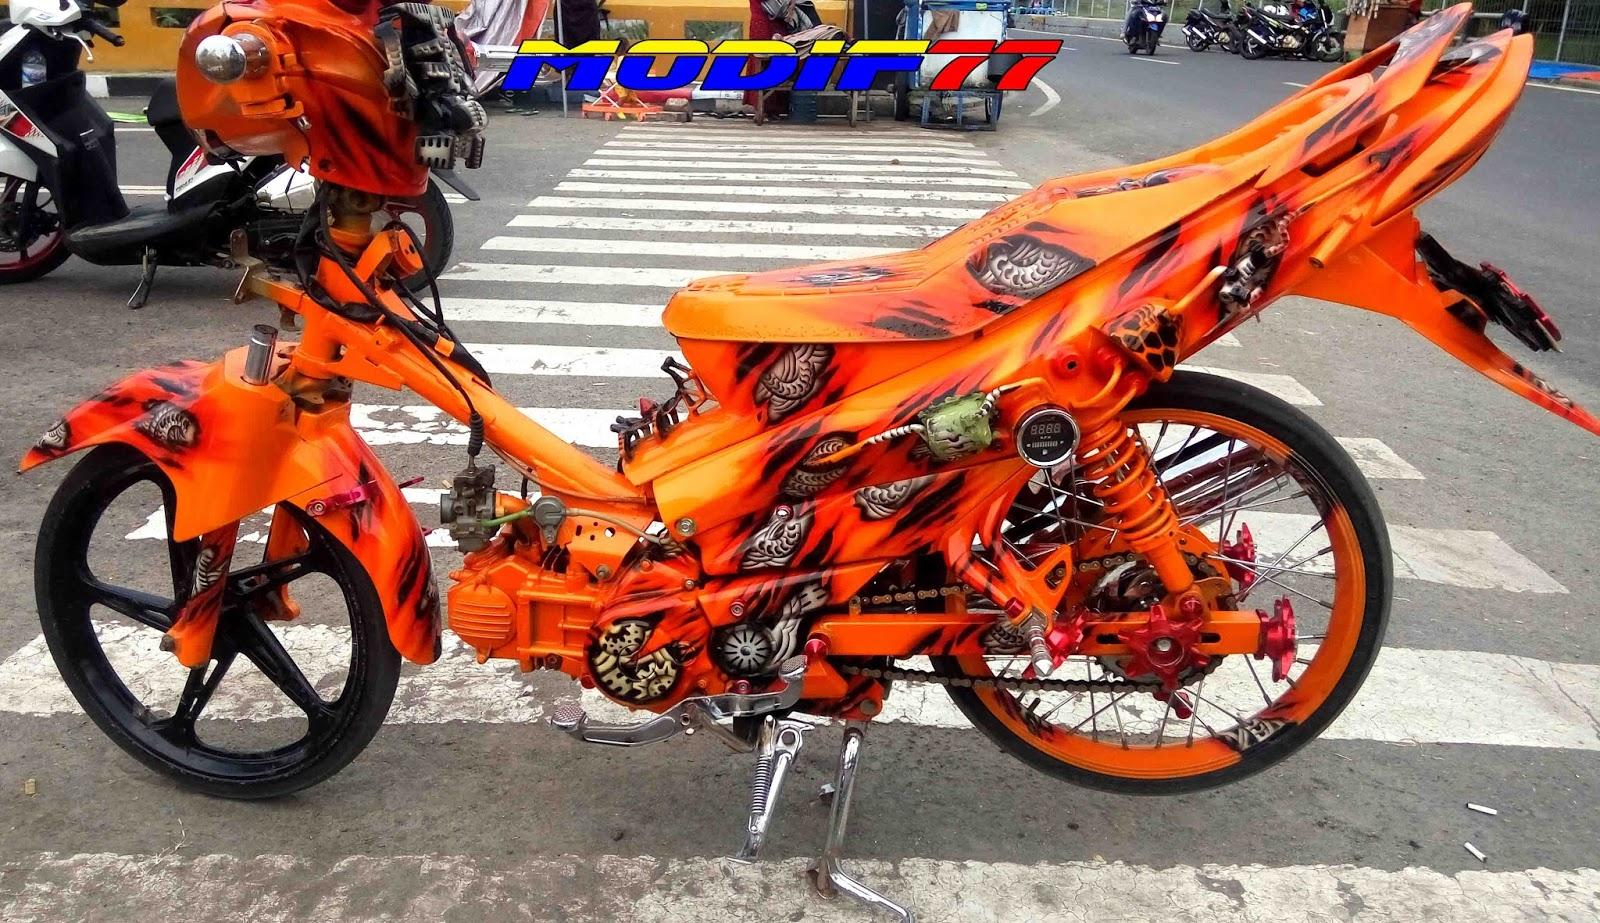 Koleksi Modifikasi Motor Jupiter Z Warna Orange Terlengkap Pojok